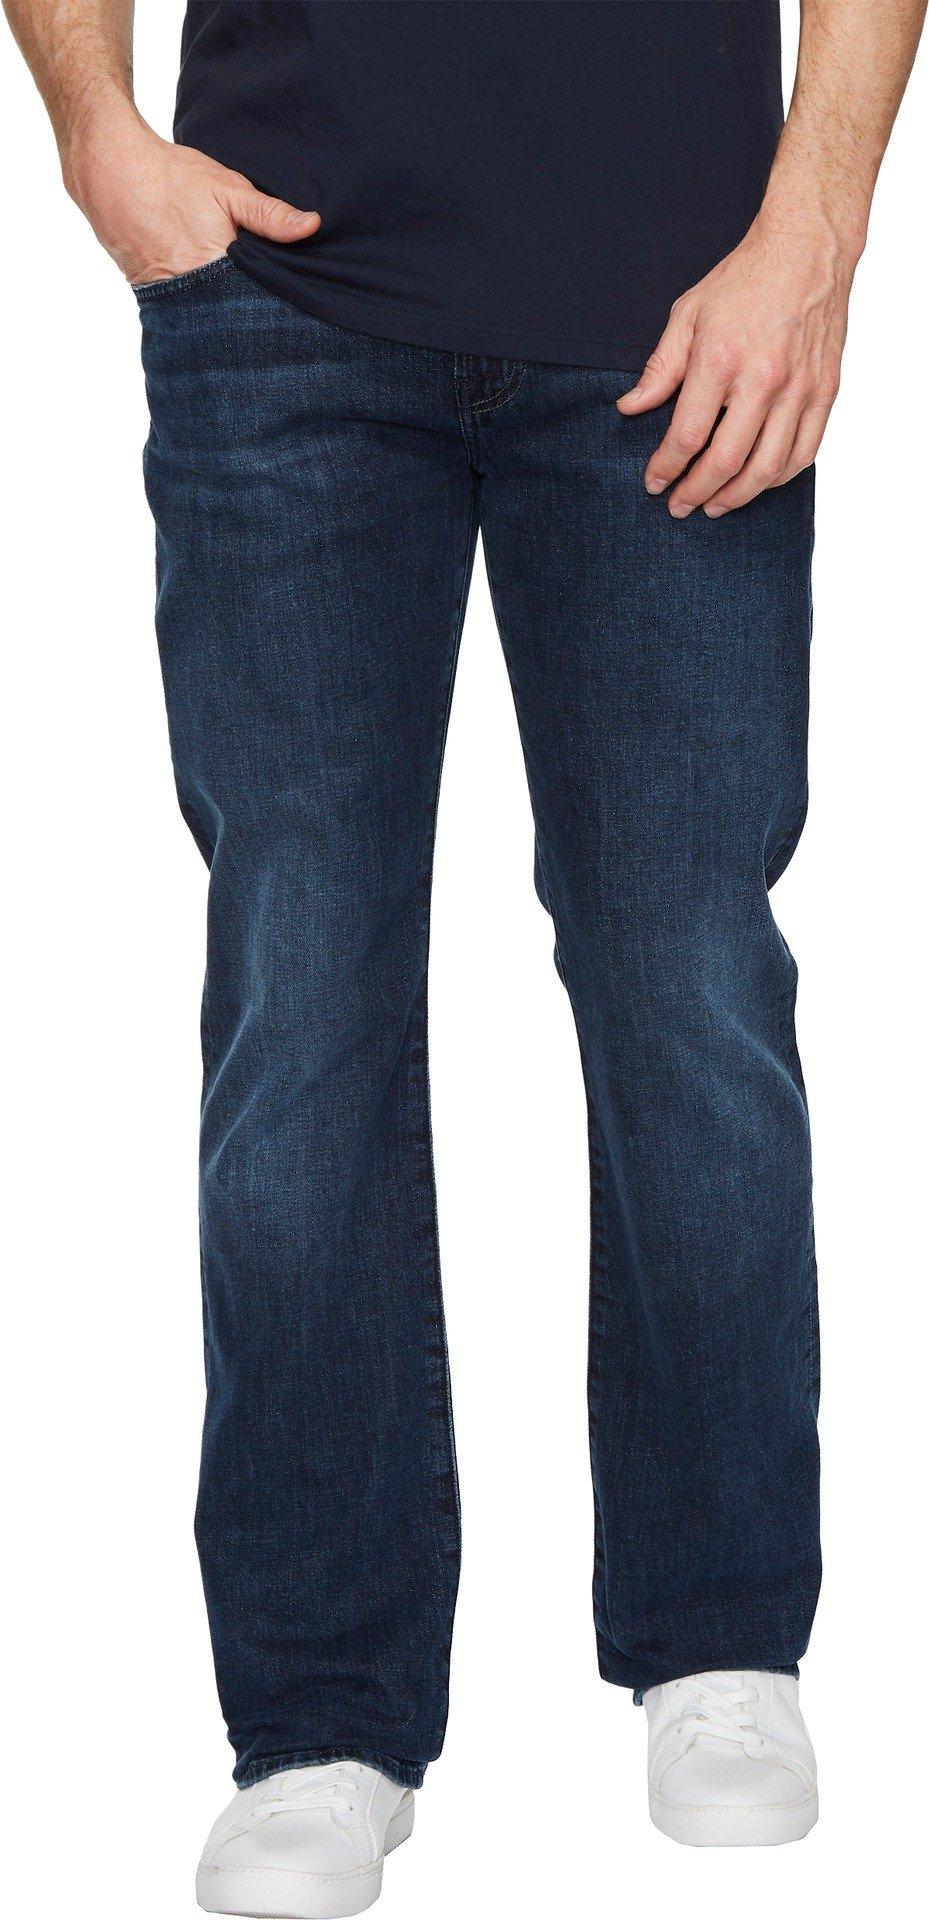 7 For All Mankind Men's Brett Slim Bootcut Jean, Chaos, 32